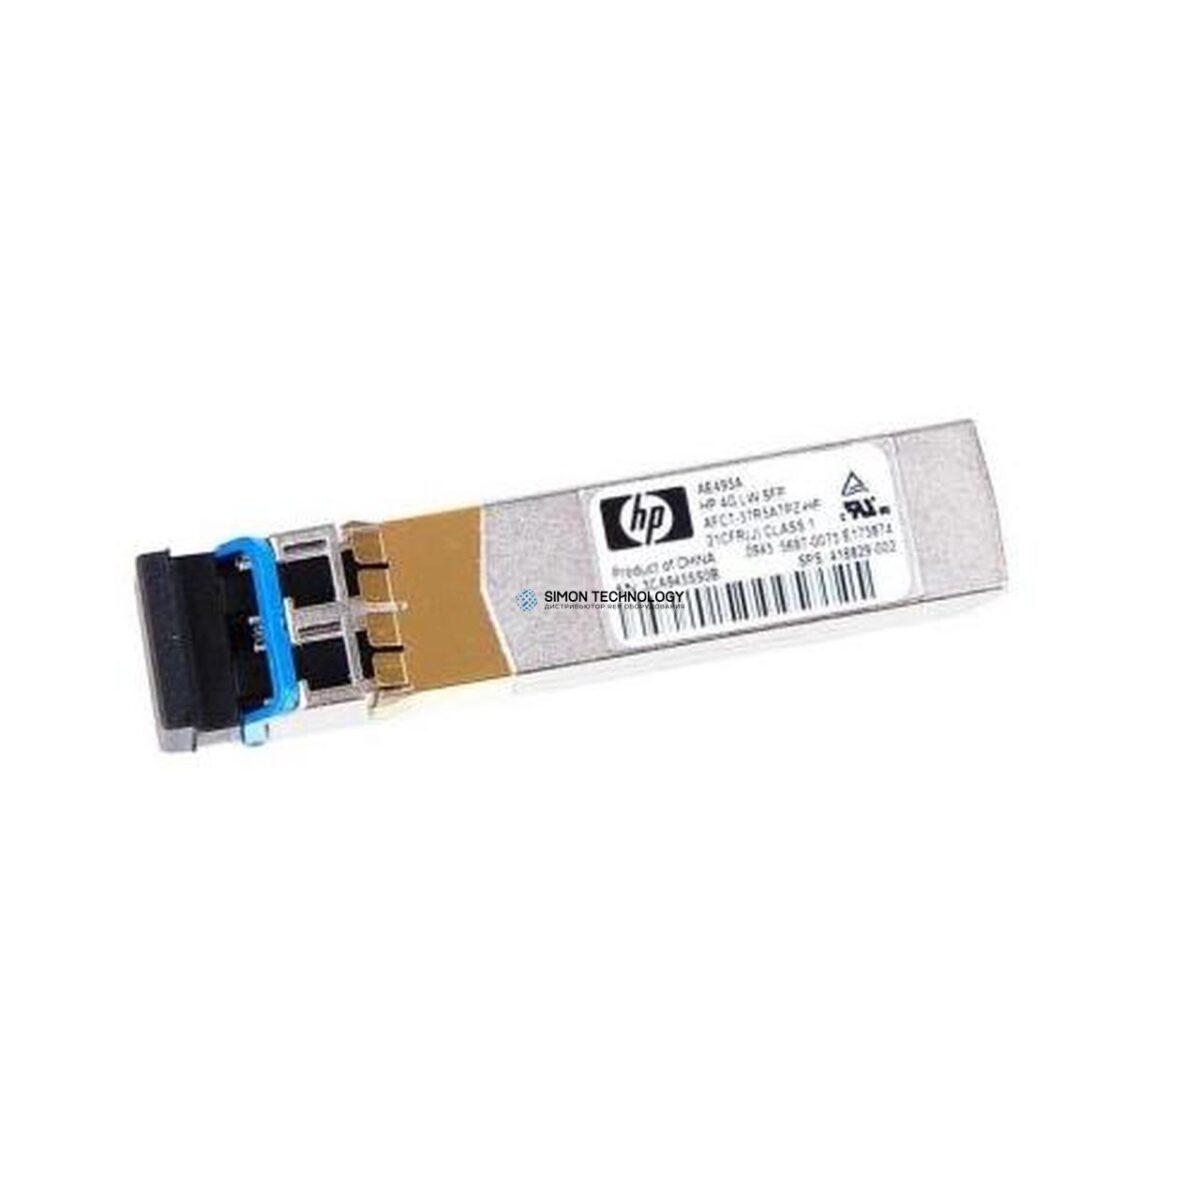 Трансивер SFP HP HPE TRANSCEIVER 4 GB 10KM LONG WAVE (416829-002)